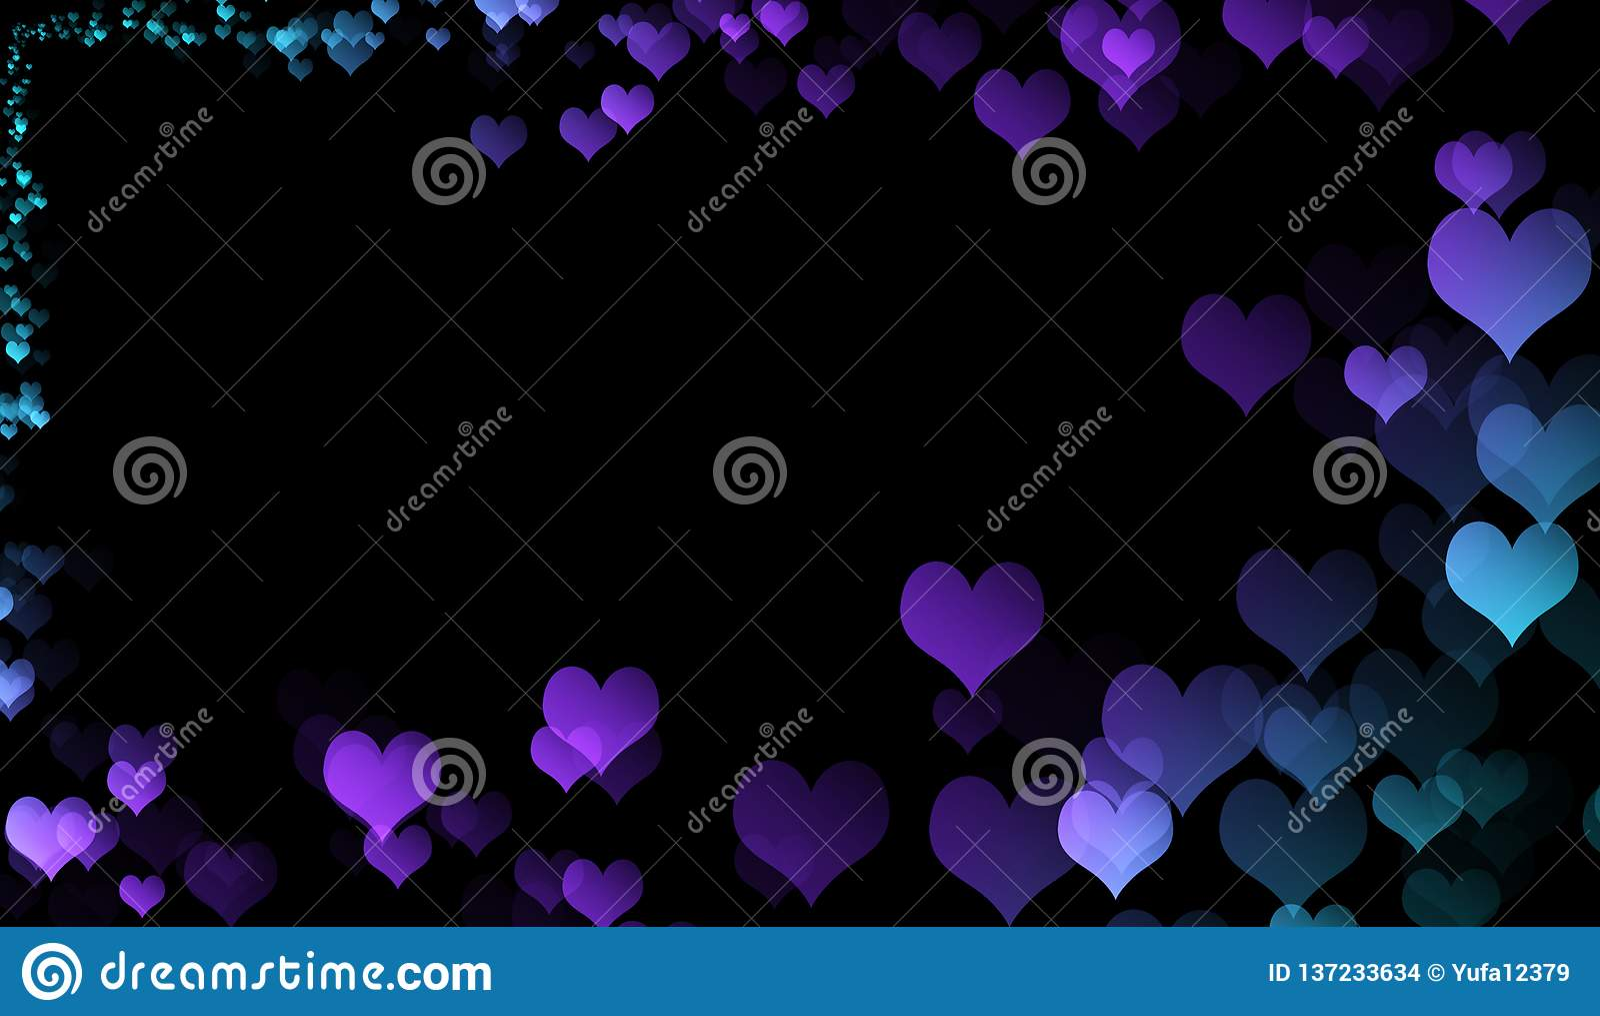 Colorful Beautiful Romantic Love Hearts Bokeh Effect For